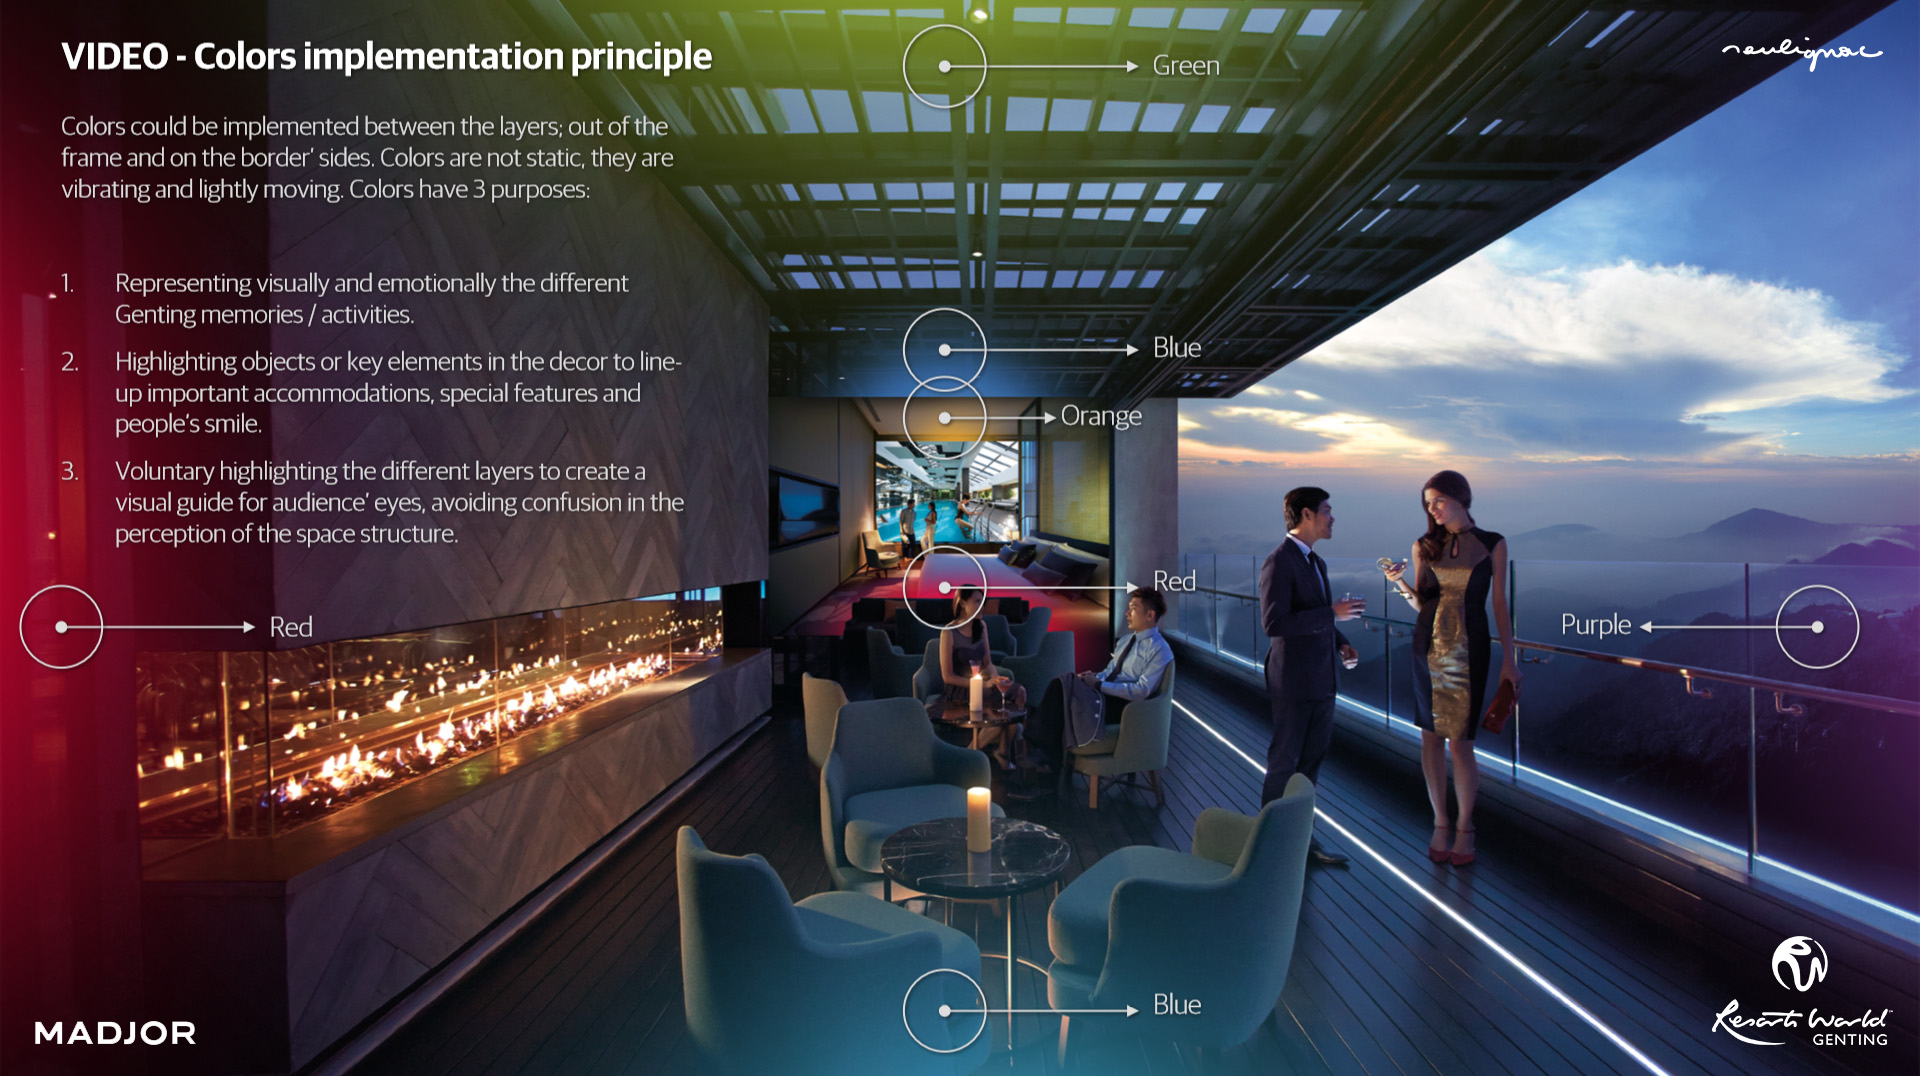 Resorts World Genting China Campaign - COLOR IMPLEMENTATION PRINCIPLE- Genting Highlands Resort - Malaysia - Francois Soulignac - Digital Creative and Art Direction - MADJOR Labbrand Shanghai, China